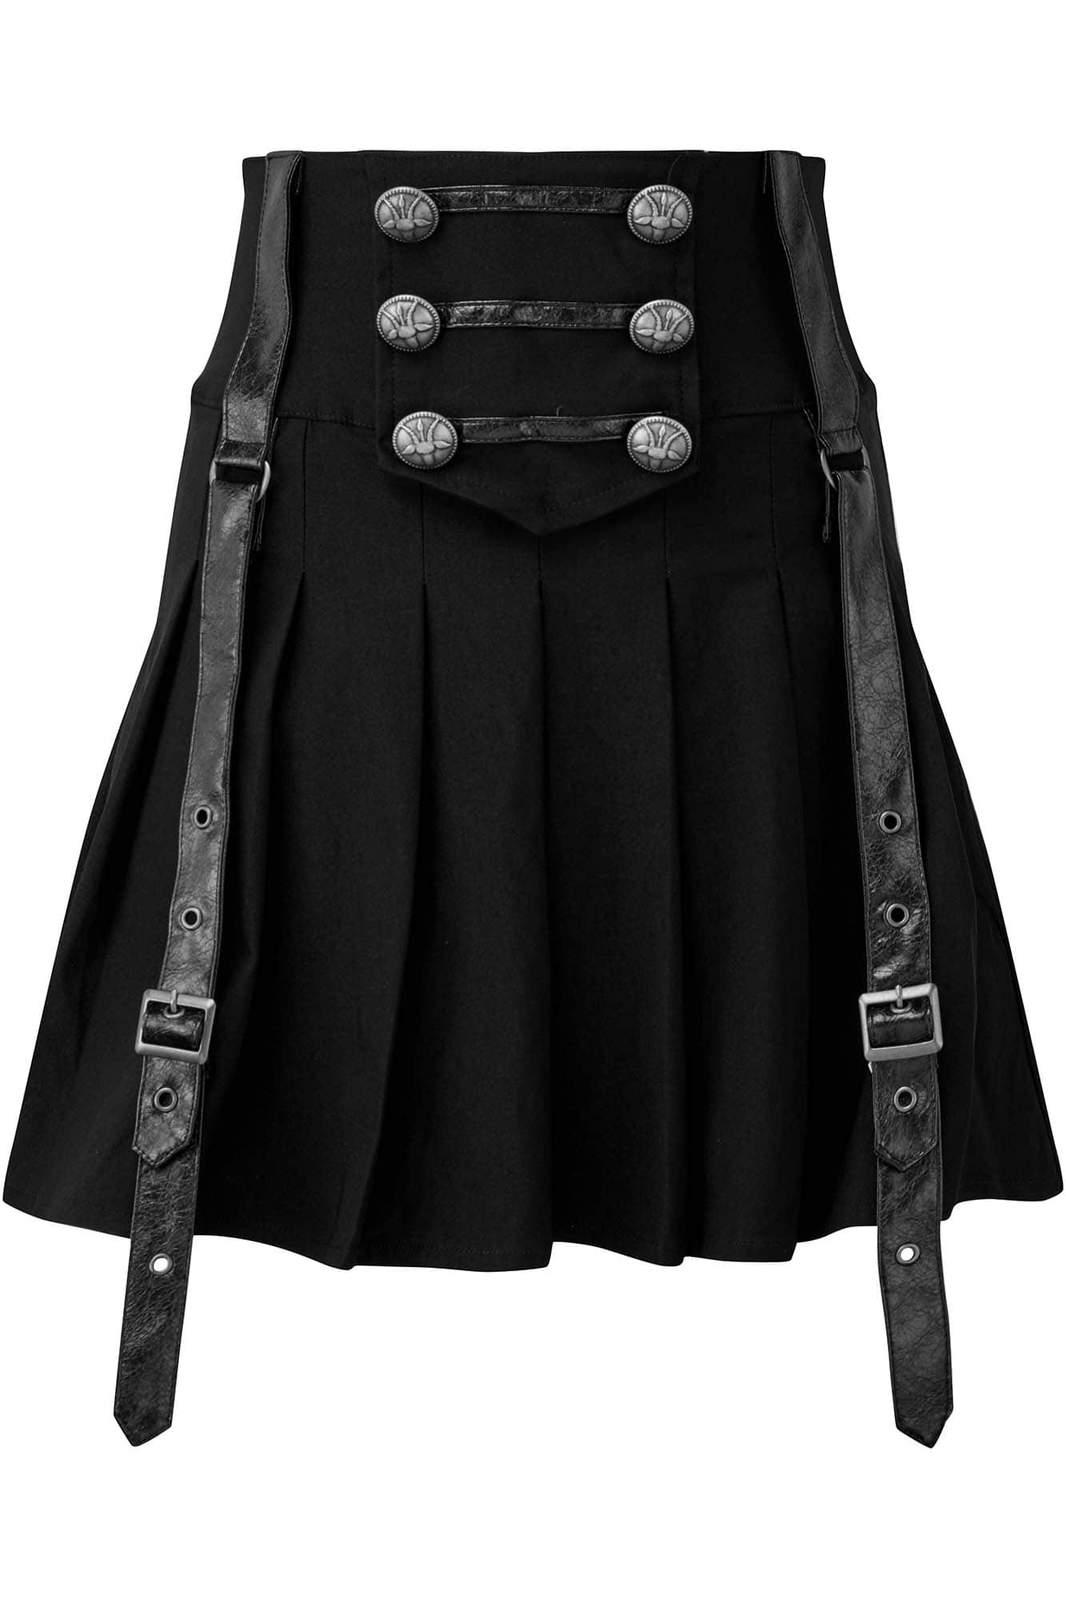 Dark Academy Mini Skirt Black by Killstar